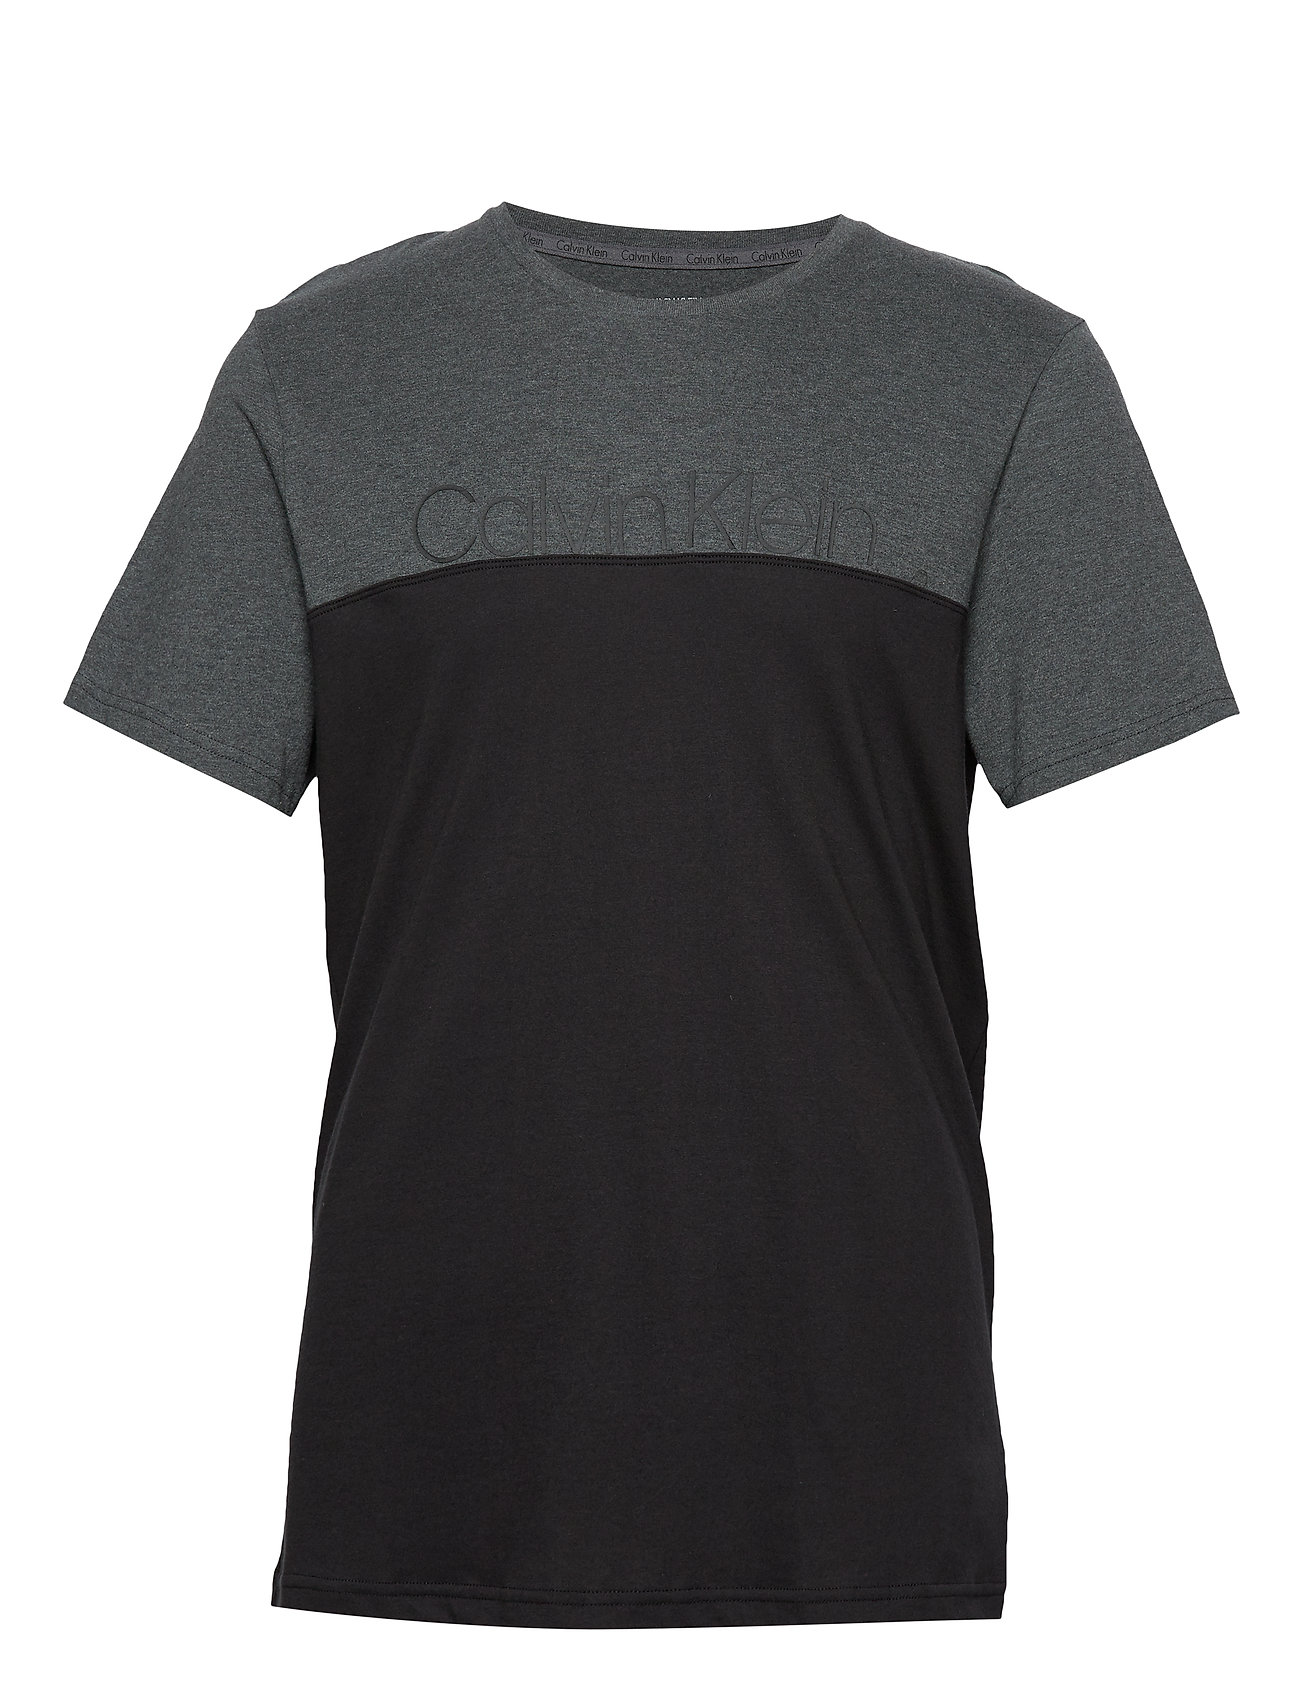 Calvin Klein S/S CREW NECK - CHARCOAL HEATHER